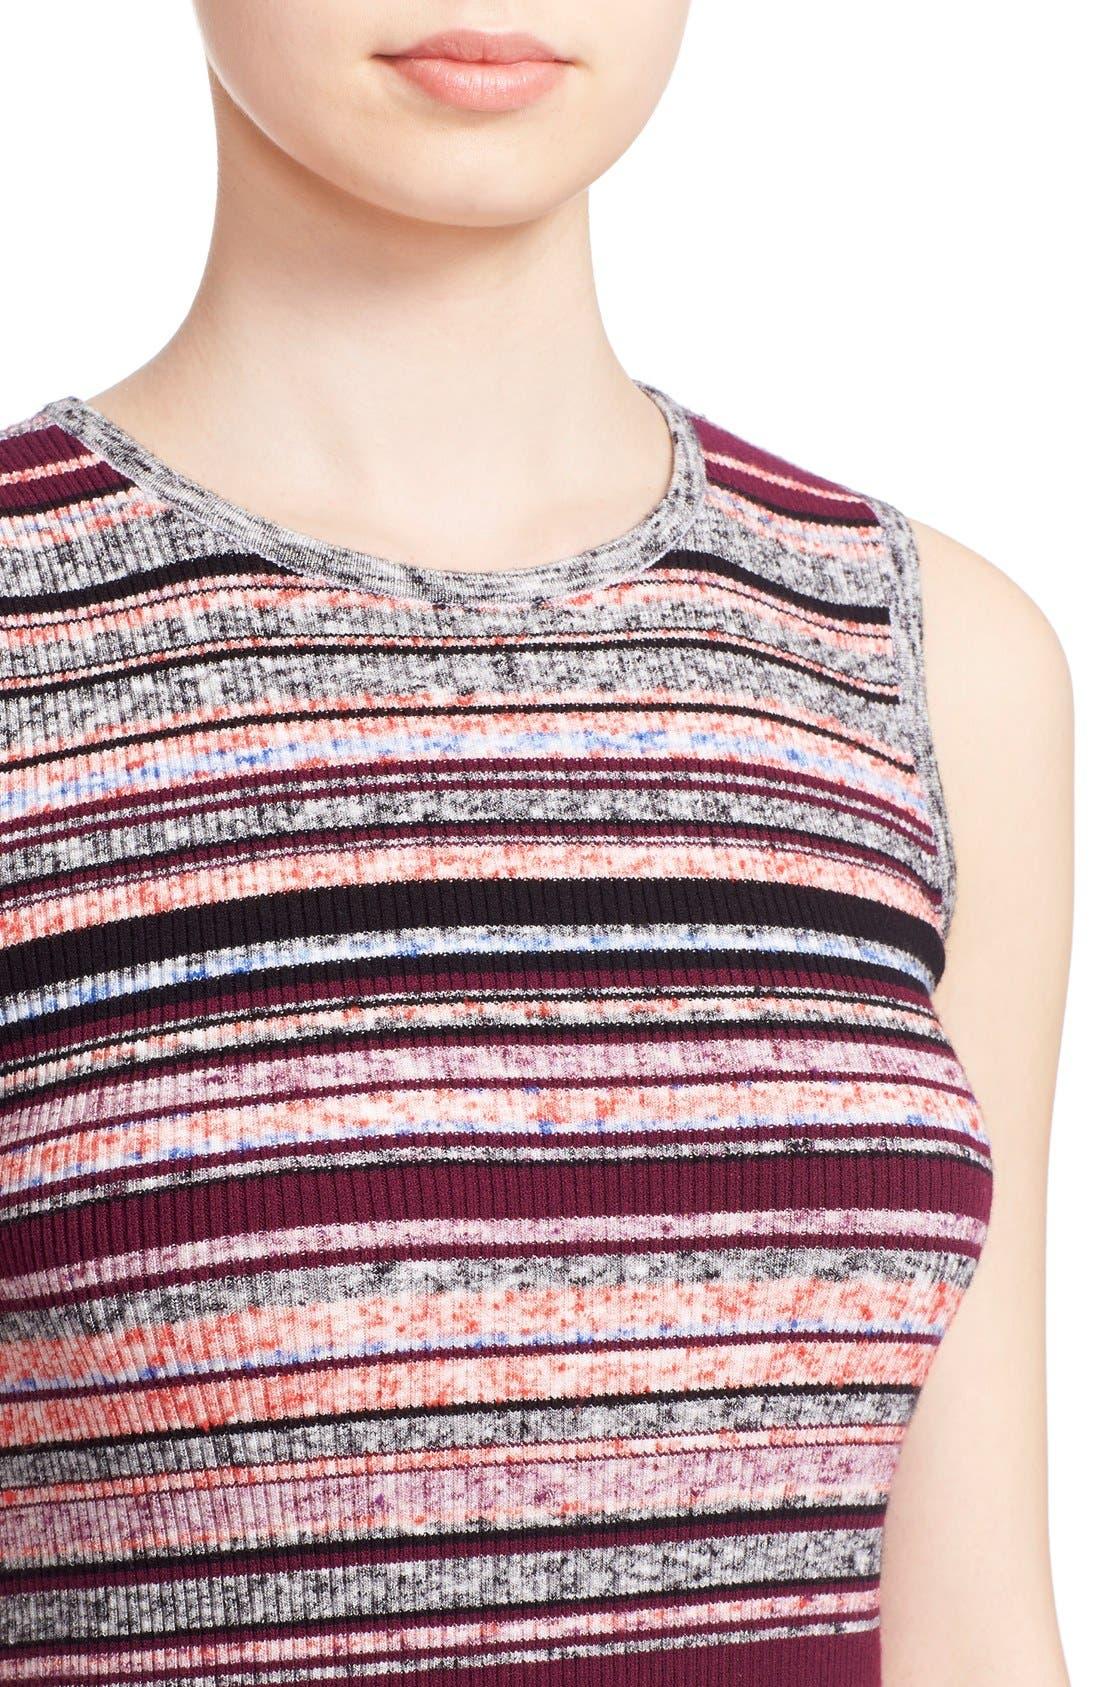 'Ash' Stripe Sleeveless Ribbed Top,                             Alternate thumbnail 2, color,                             930